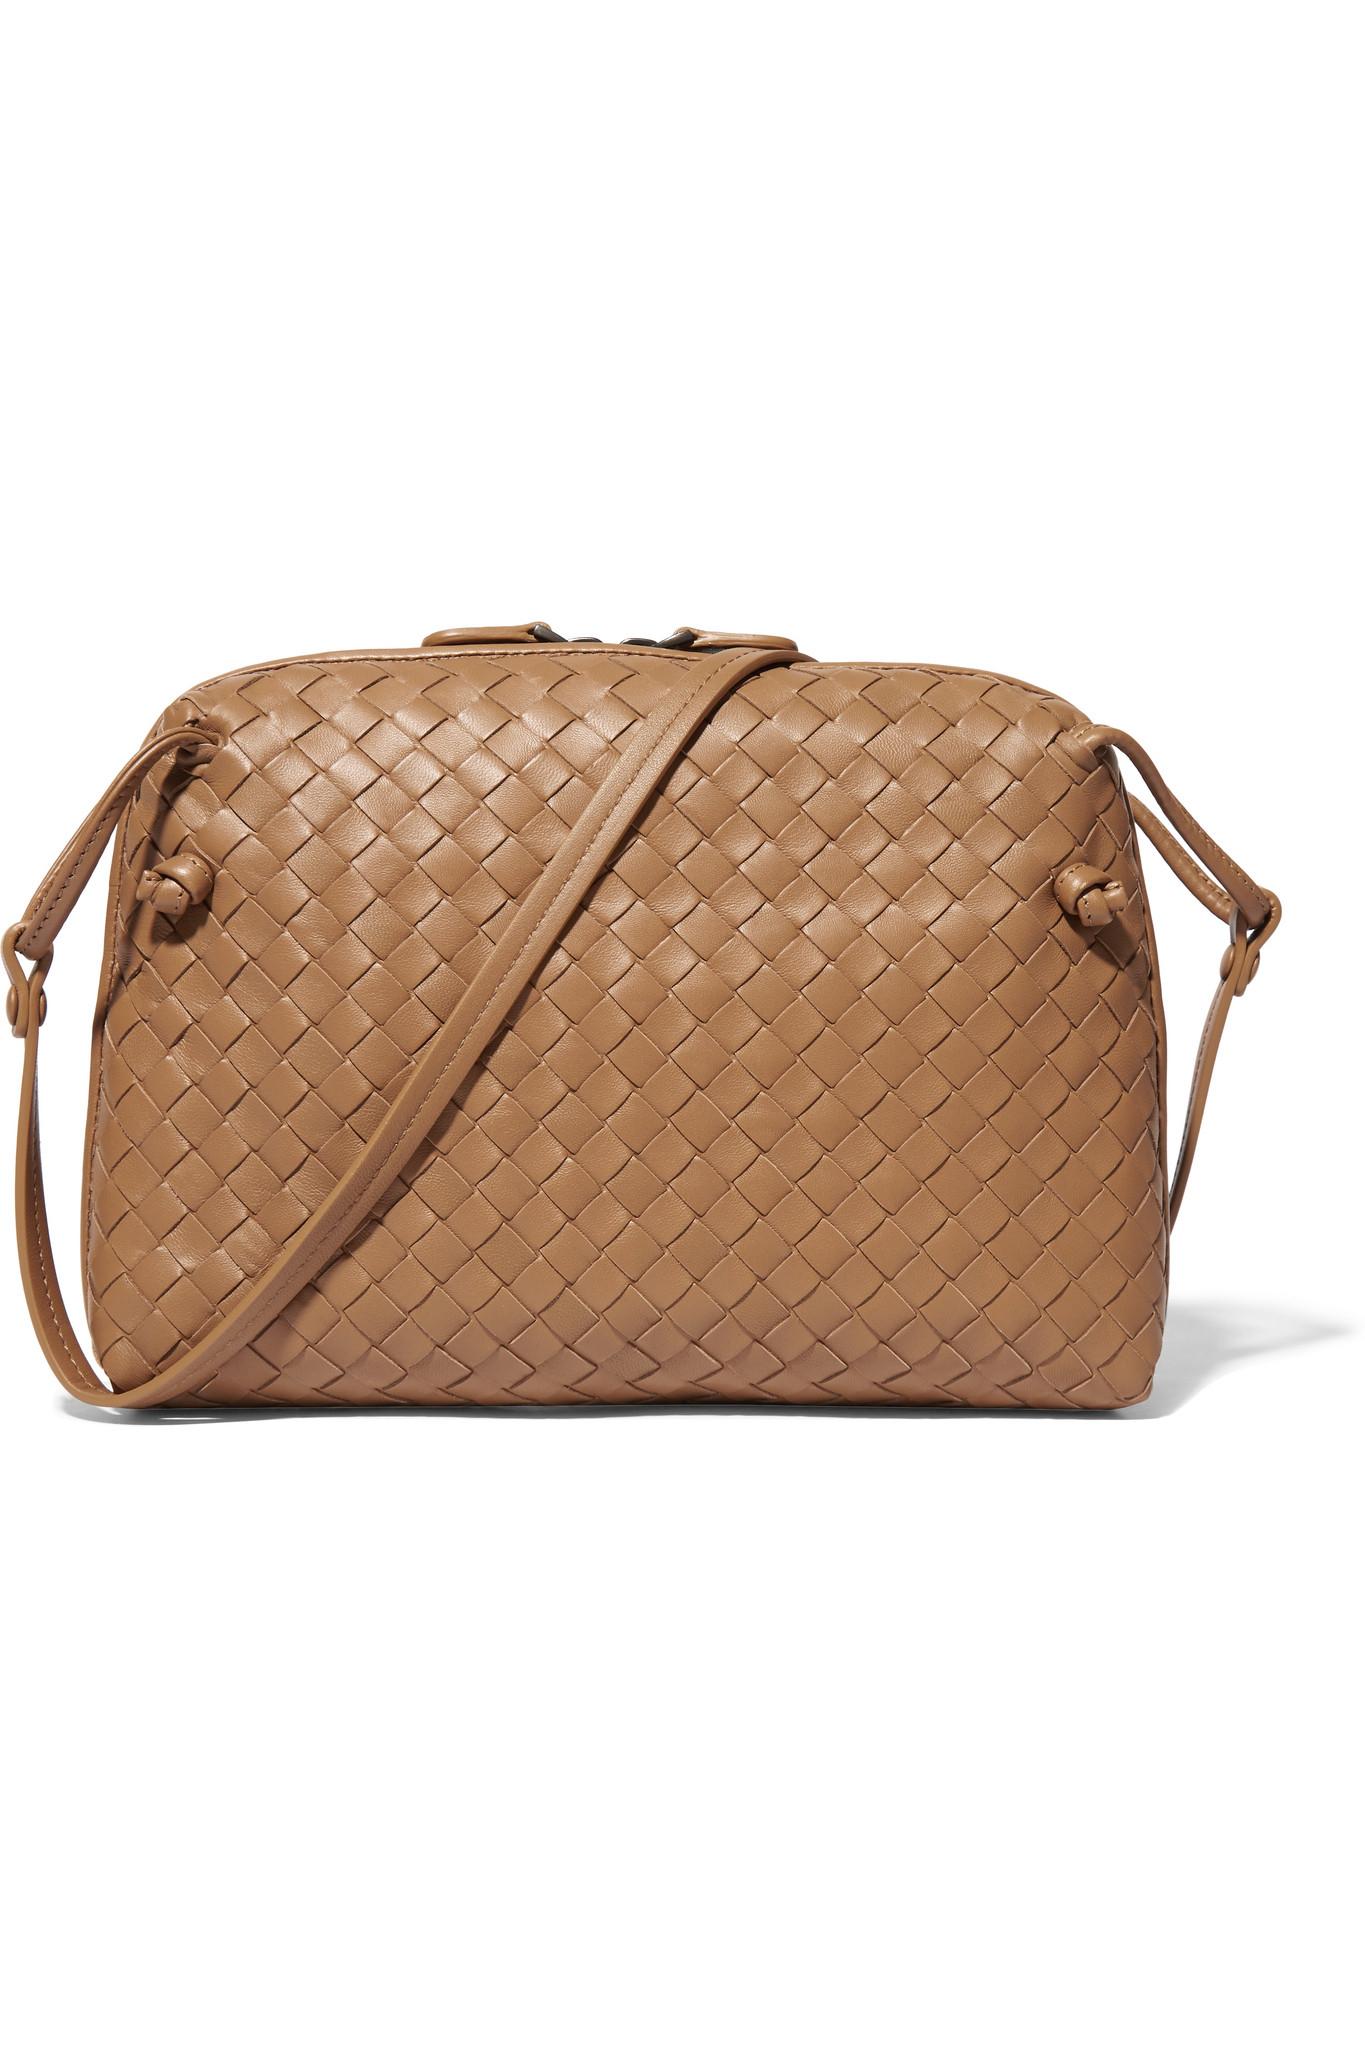 Bottega Veneta Messenger Intrecciato Leather Shoulder Bag in Natural ... a669fe89a317e